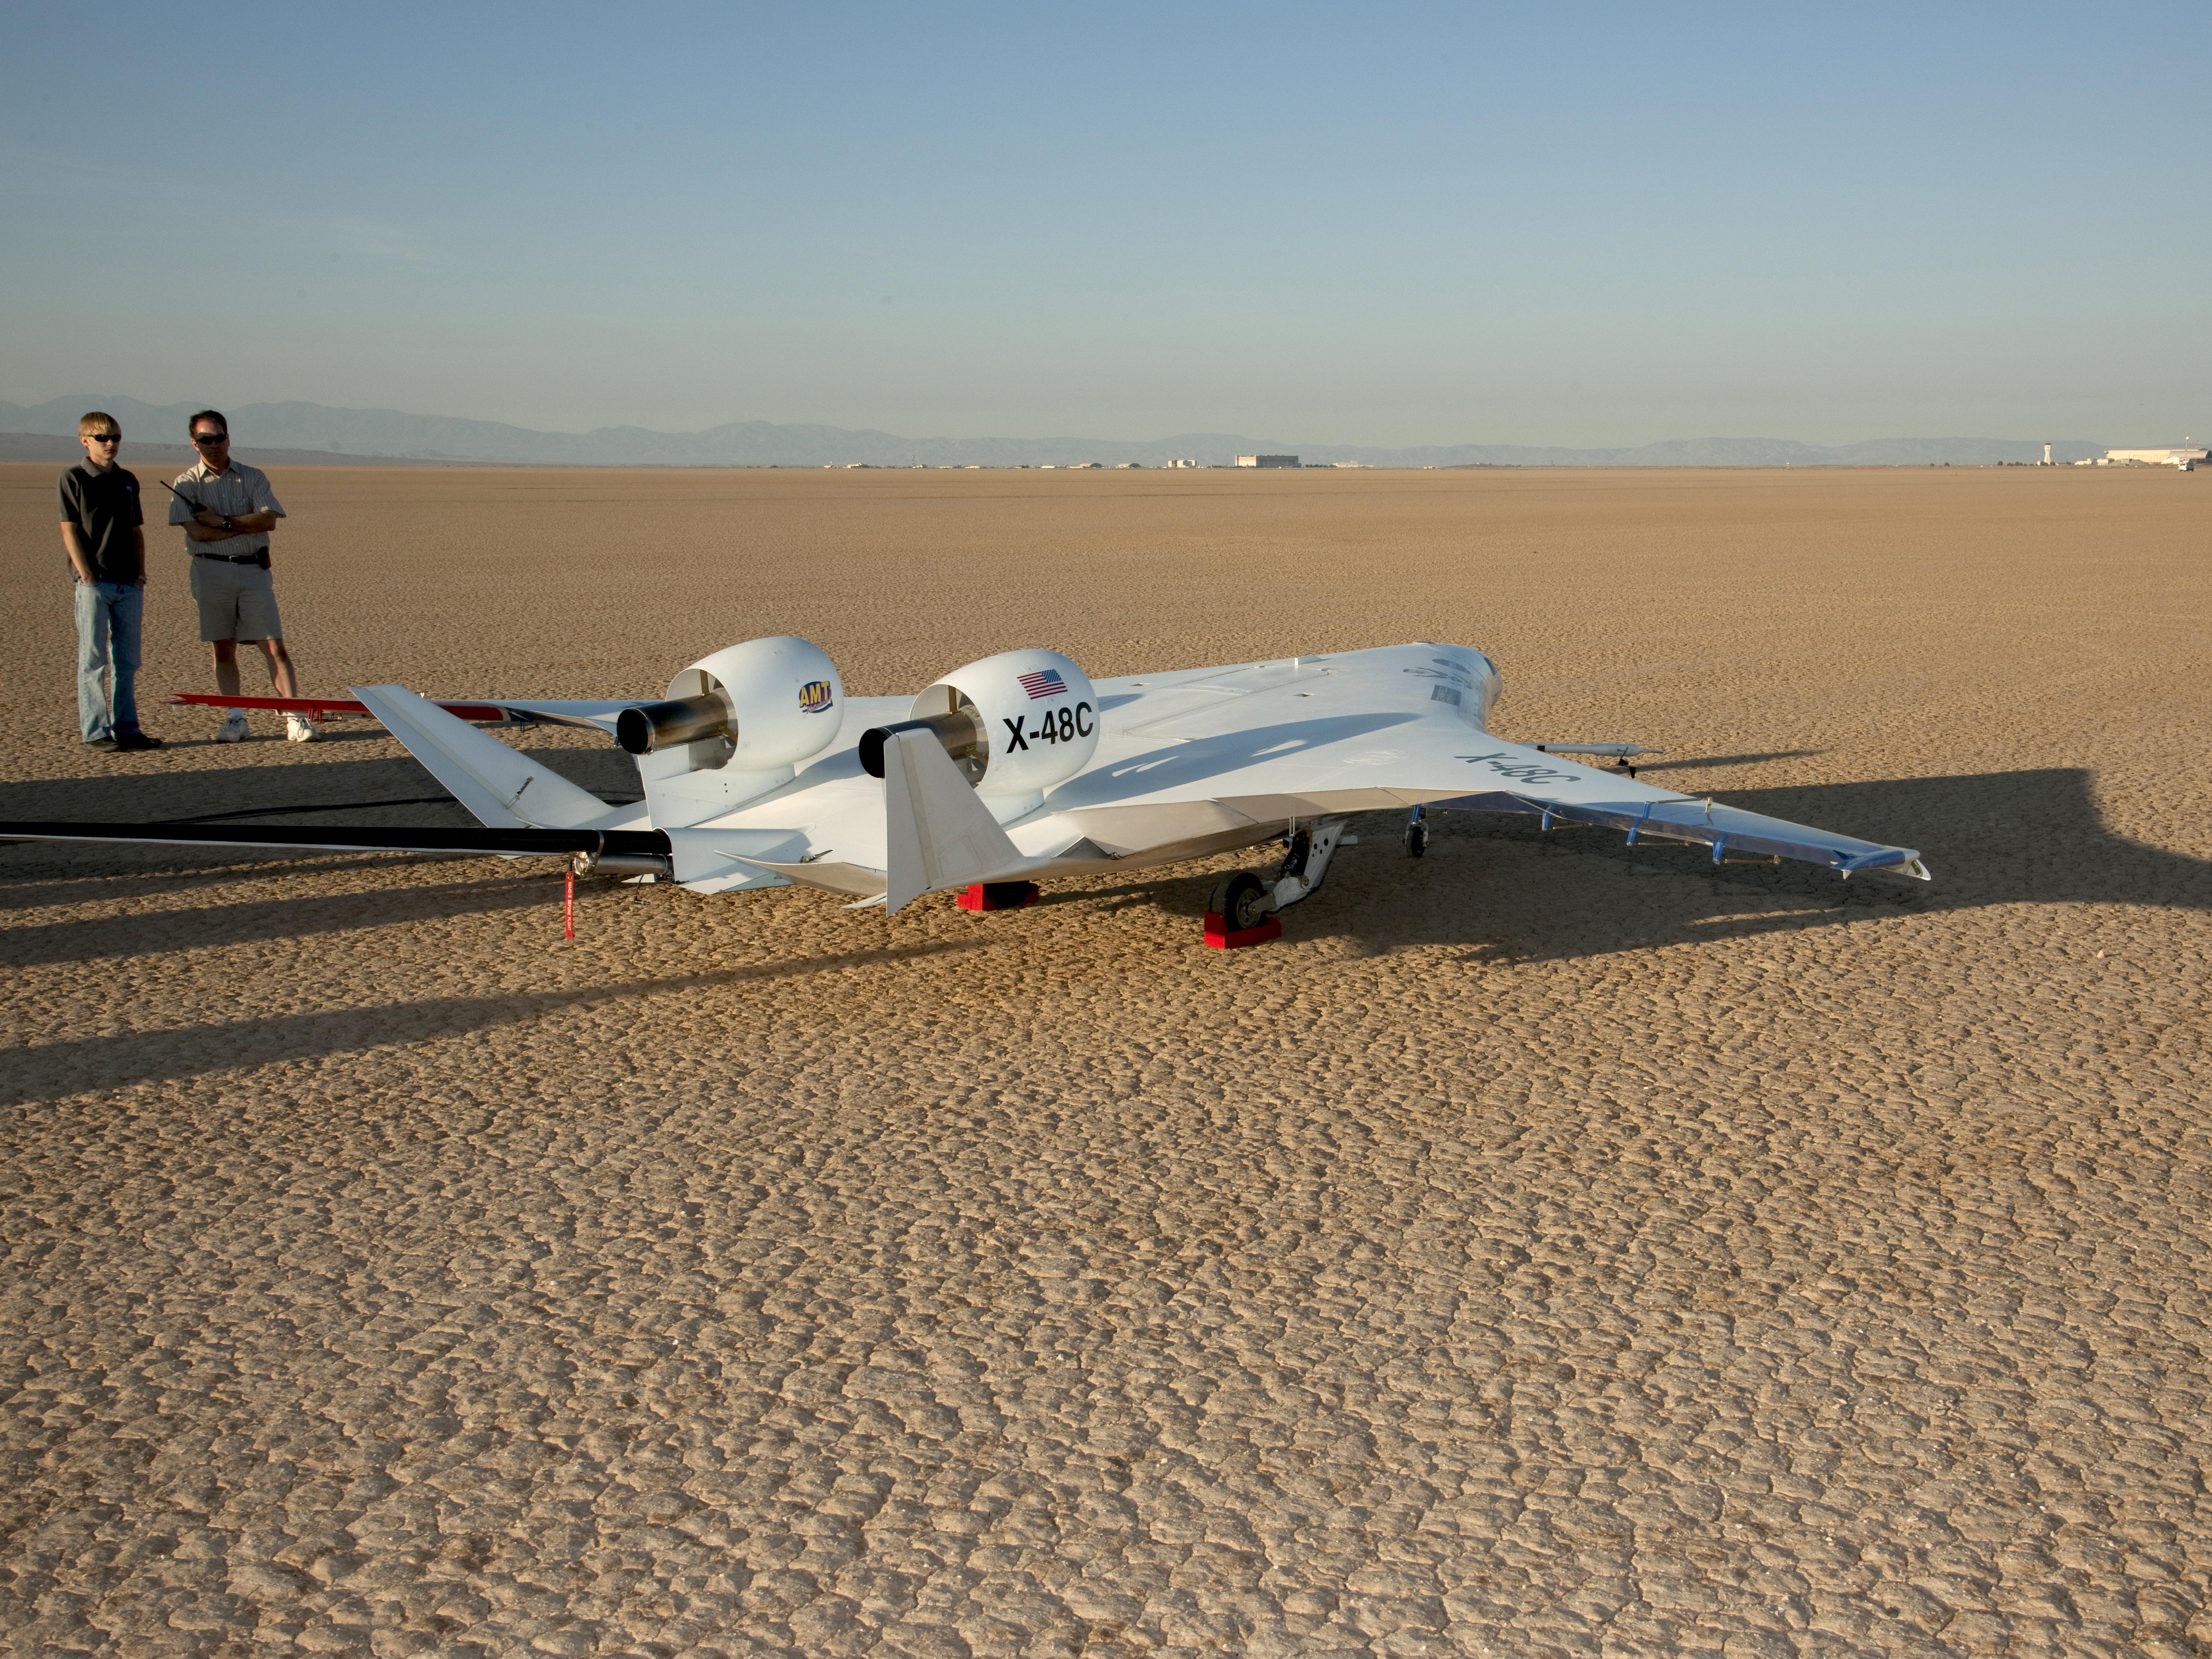 X-48C: An X-Plane Transformer   NASA